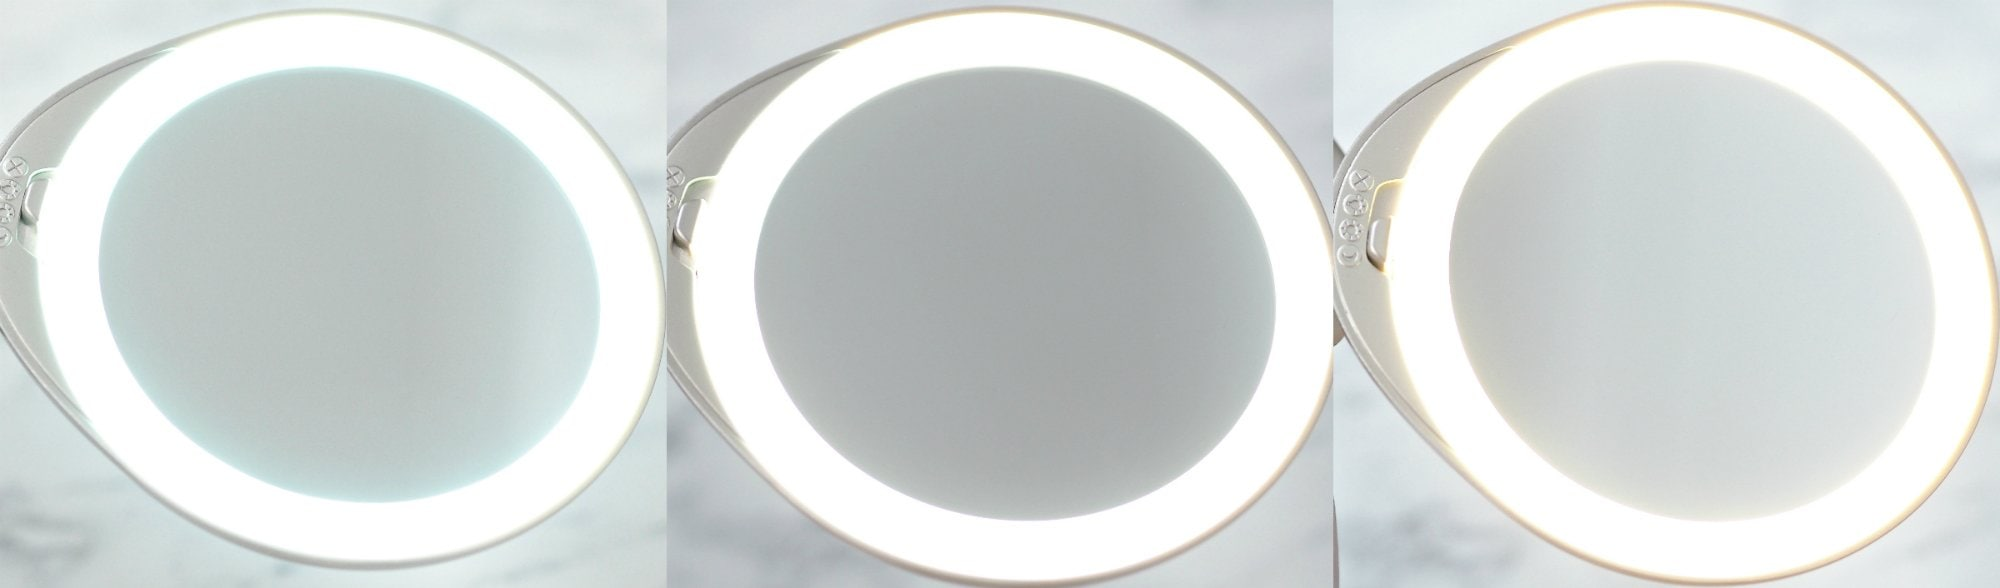 Tweezerman Adjustable Lighted Mirror Review - Mirror with three light settings